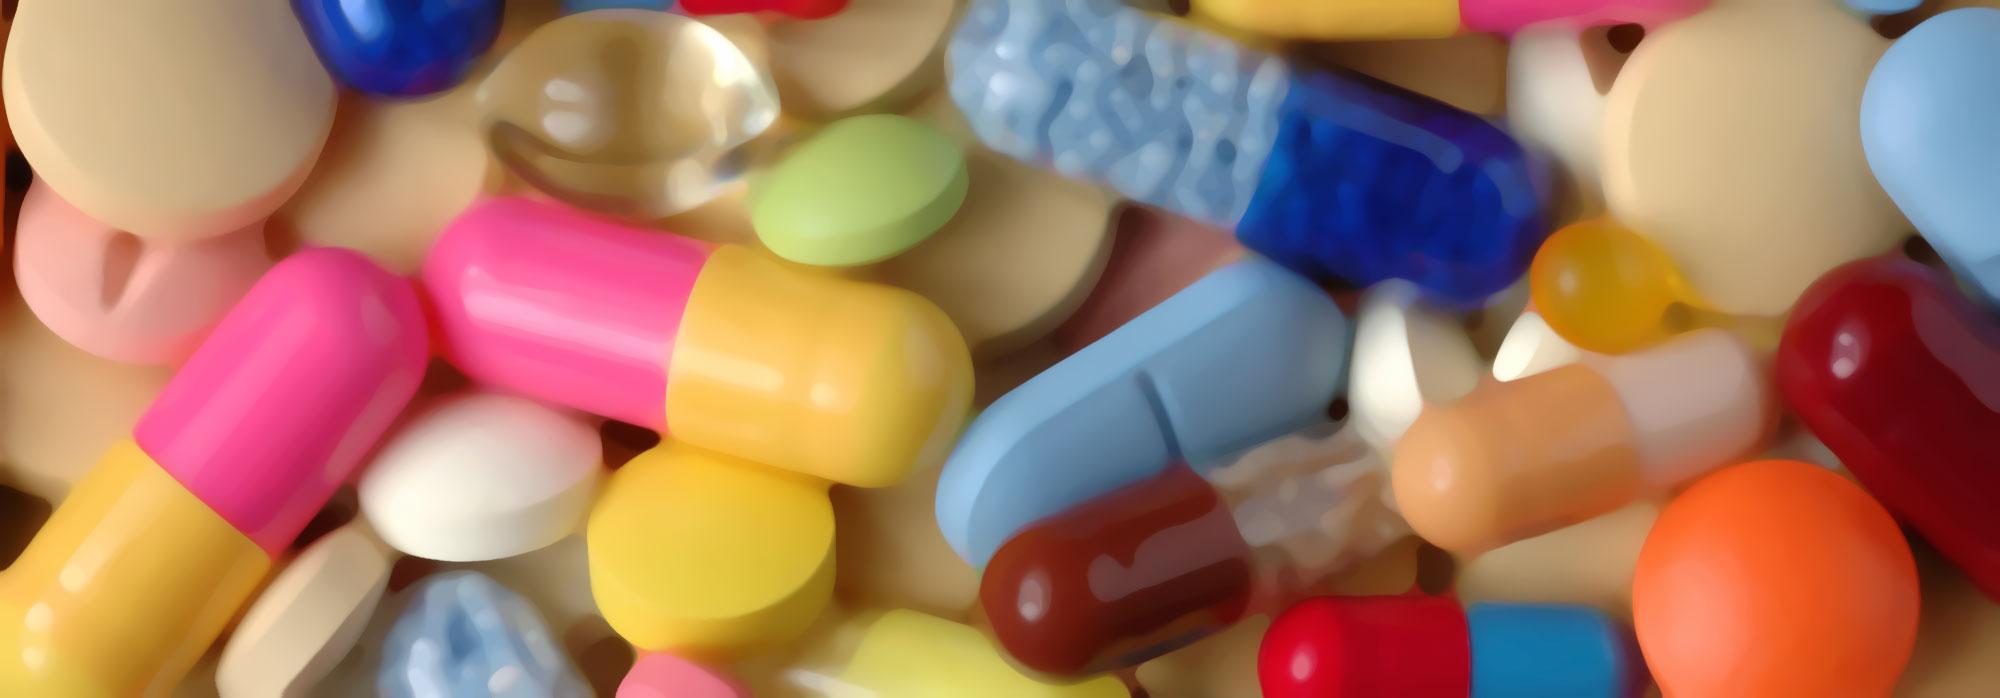 Trazodone Sleep Medications